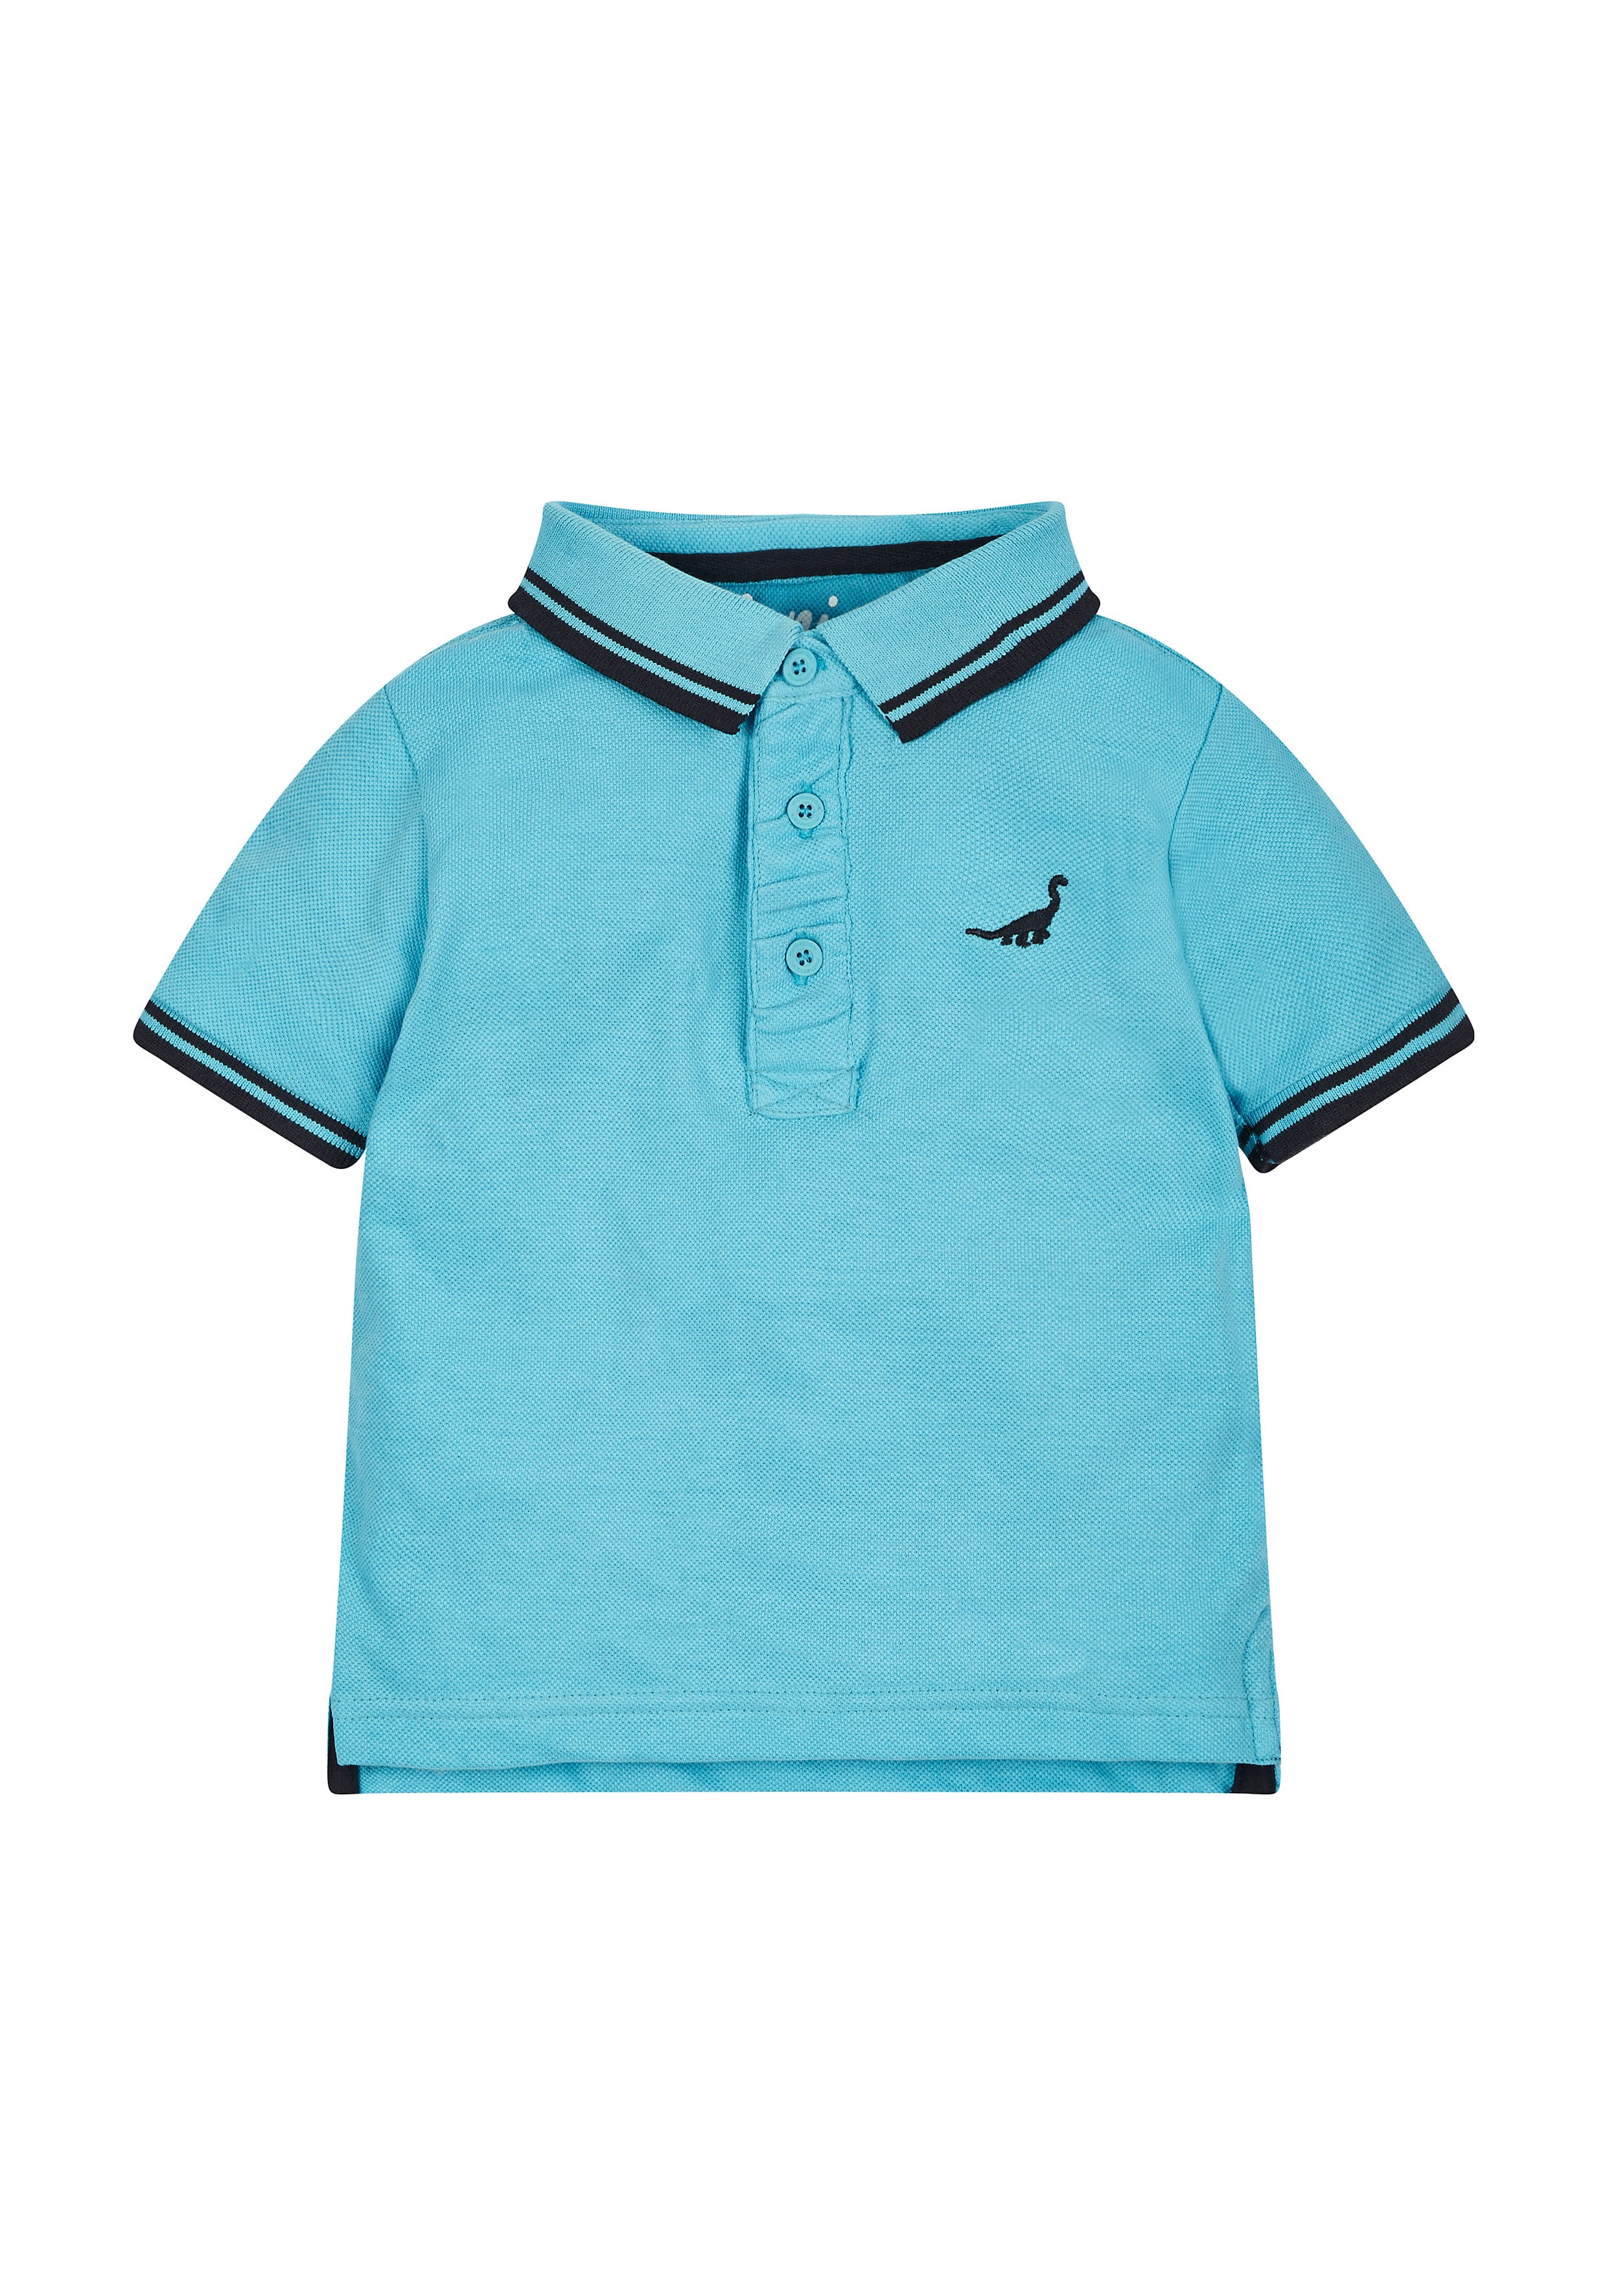 Mothercare | Boys Turquoise Dinosaur Polo Shirt